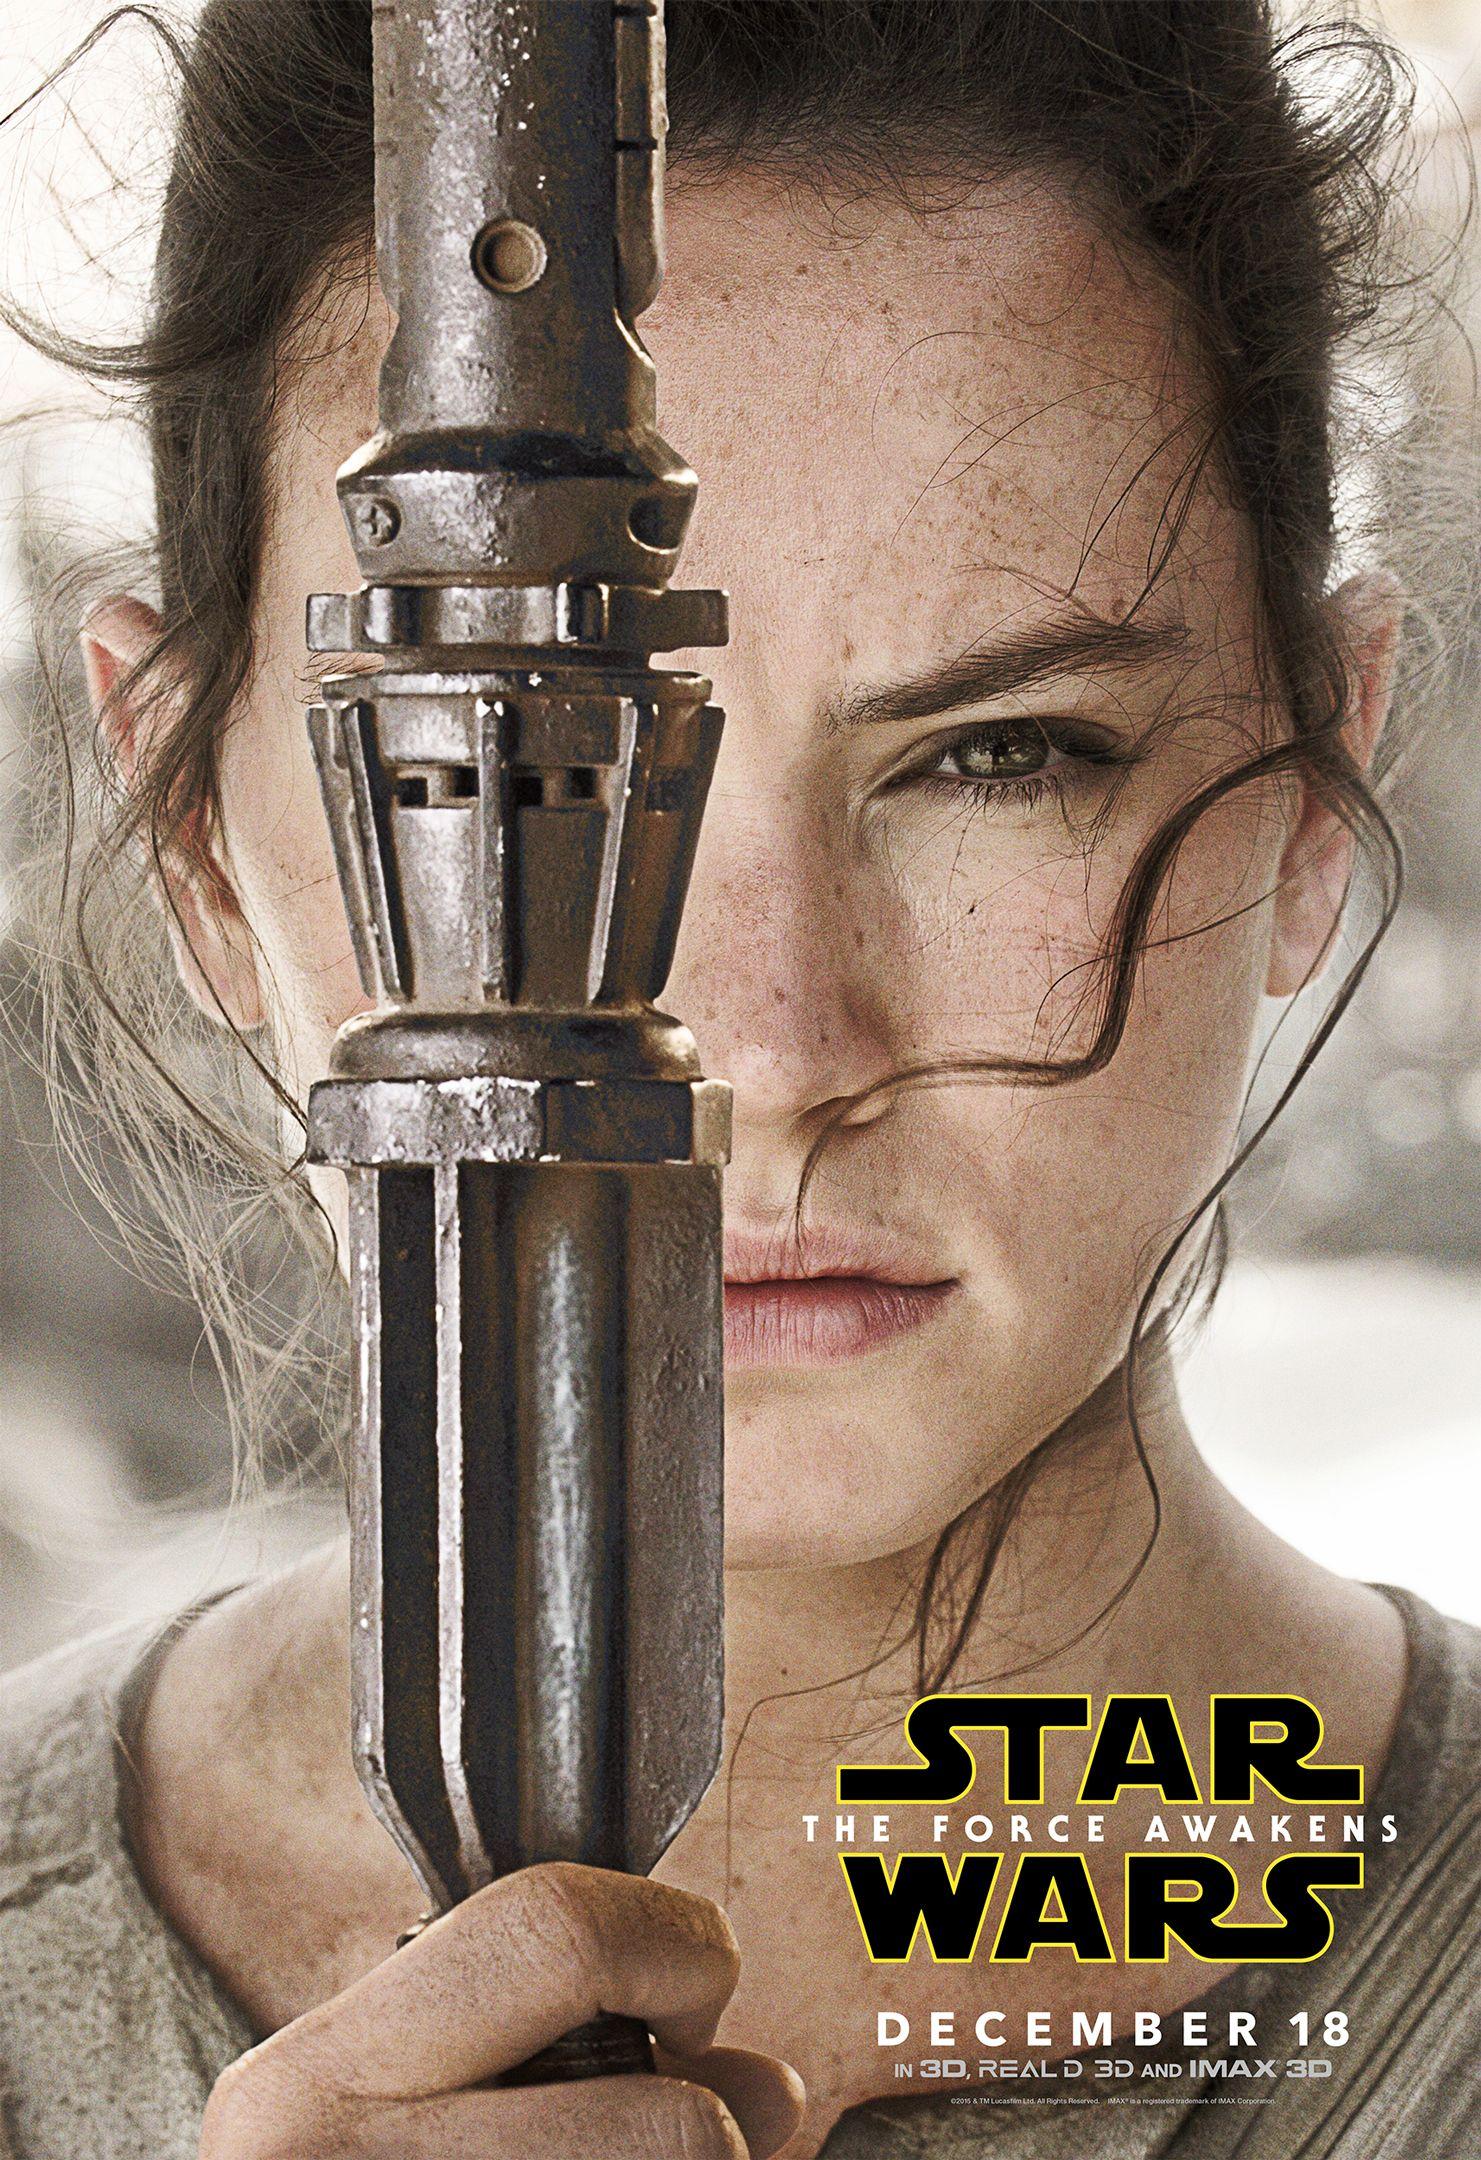 STAR WARS EPISODE VII FORCE AWAKENS REY MOVIE POSTER Licensed Authentic 22x34